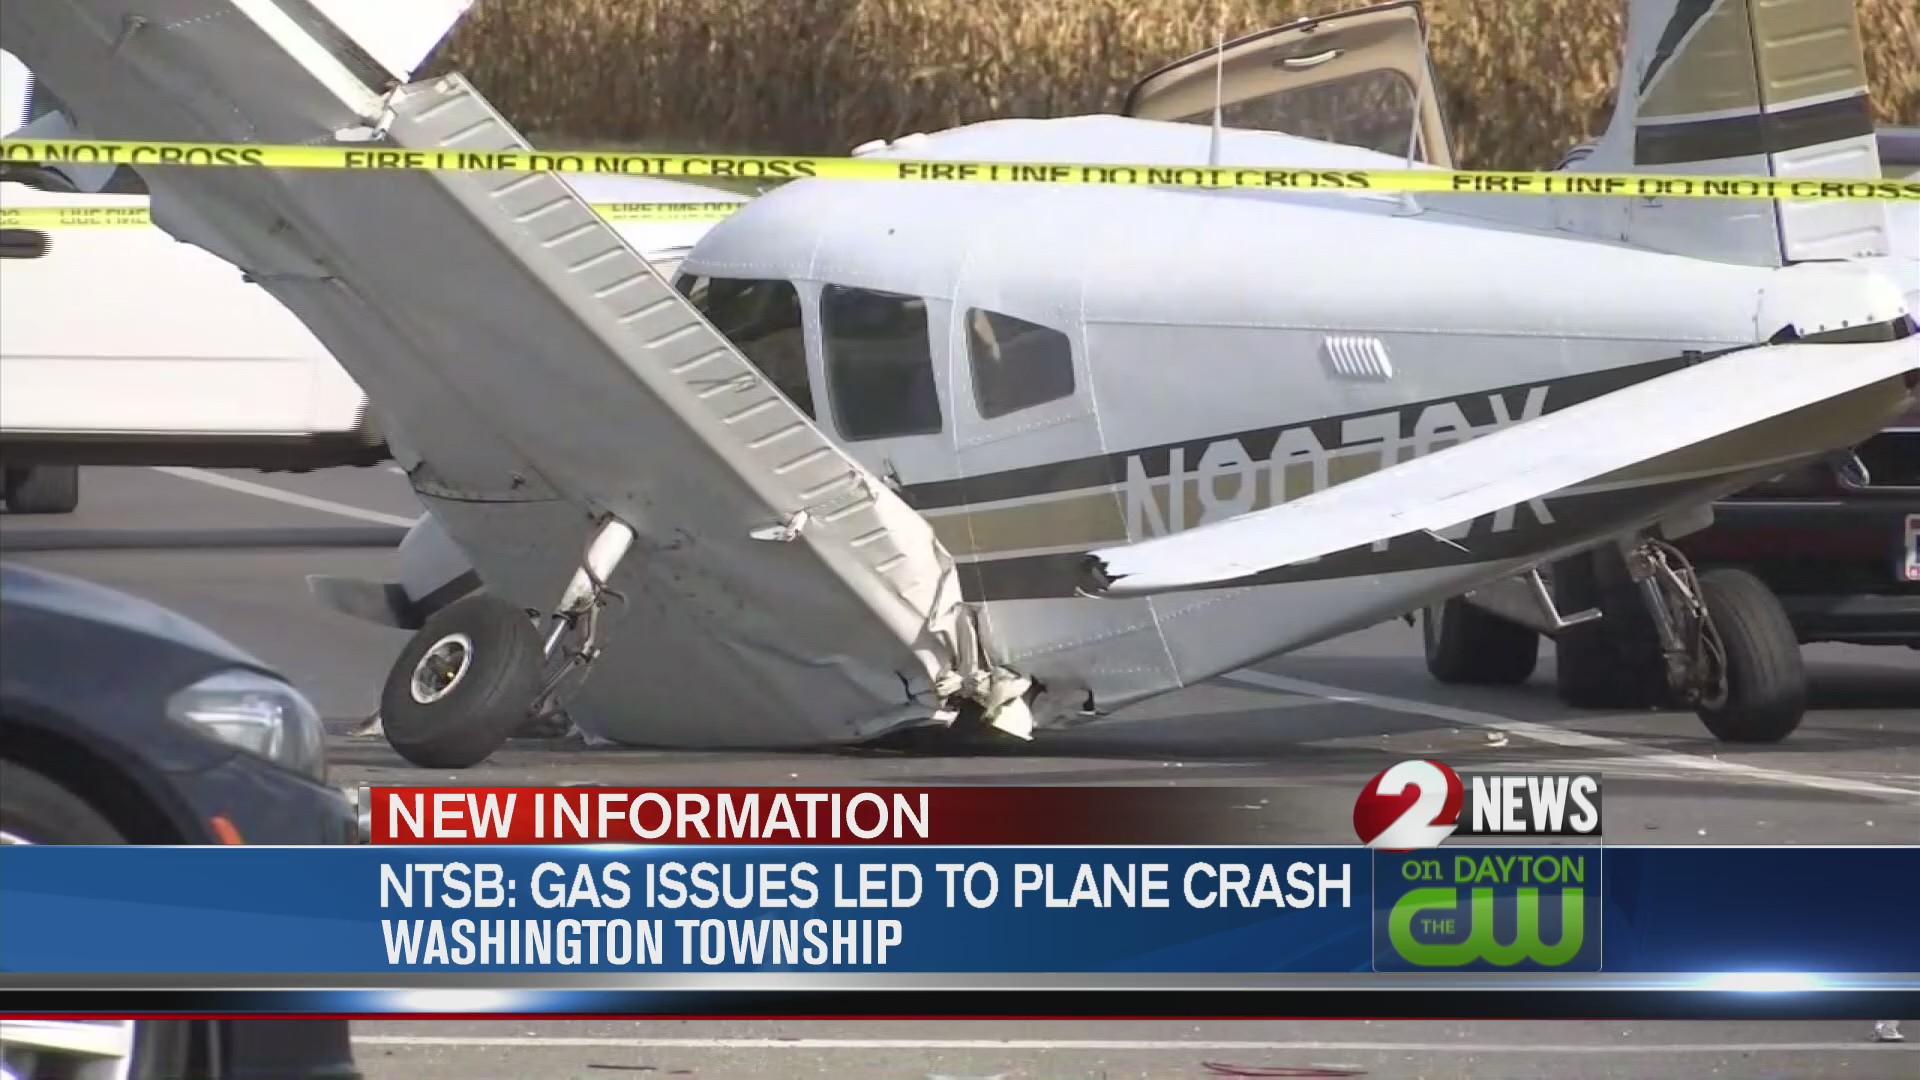 Gas issues led to plane crash in Washington Twp.